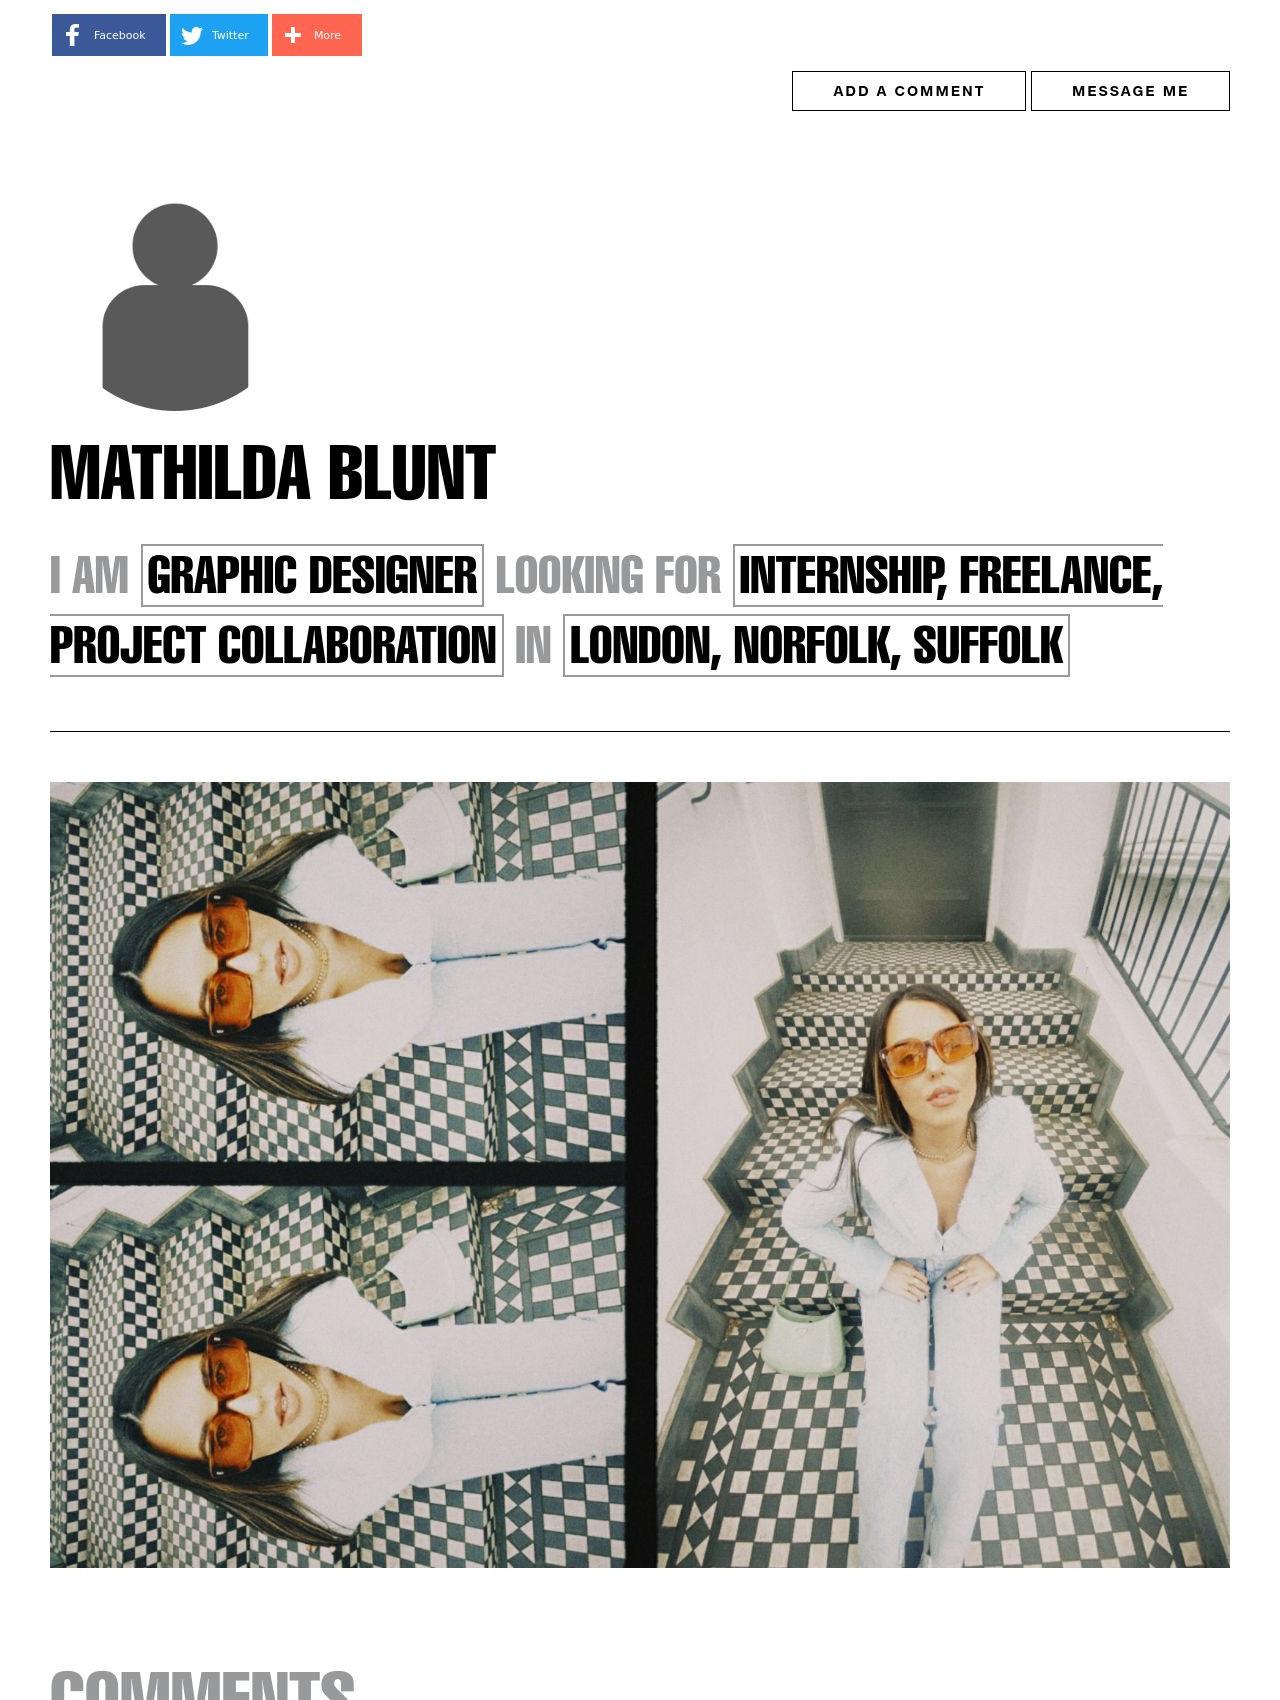 Mathilda Blunt